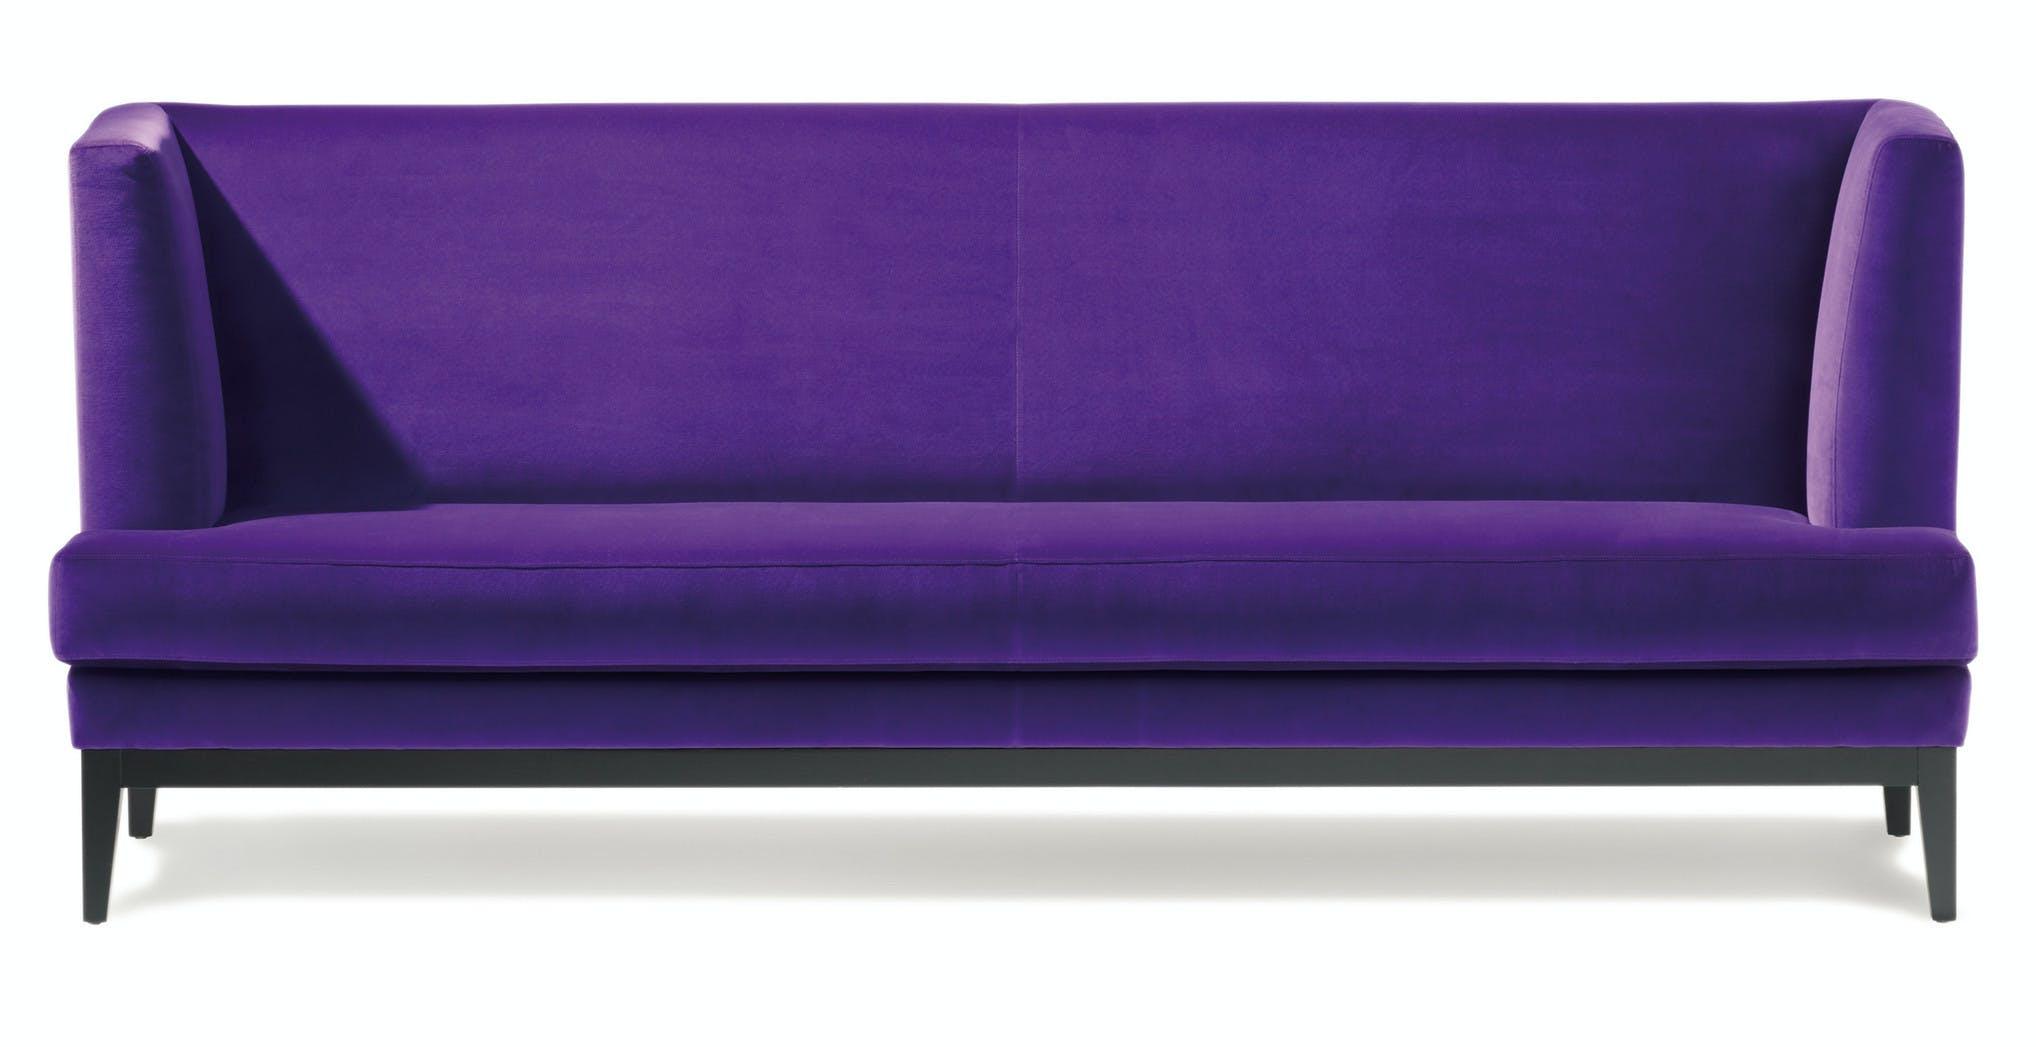 Jab Anstoetz Purple Polo Dining Sofa Haute Living